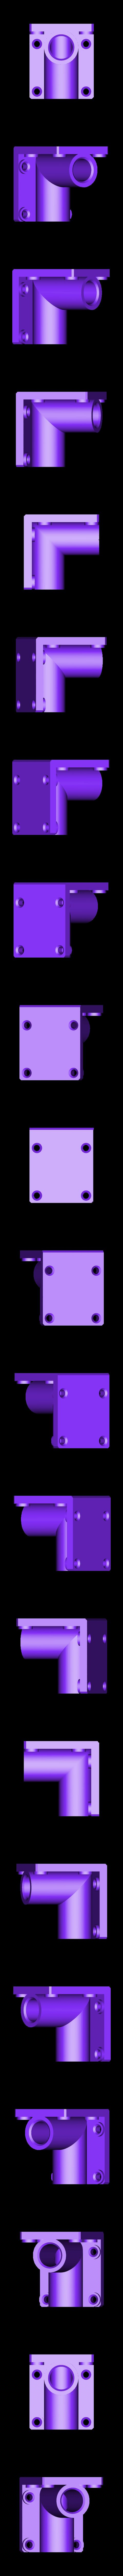 P&B_14.stl Download free STL file P & B ARMY (PIPE AND BOARD) • 3D printable model, DJER